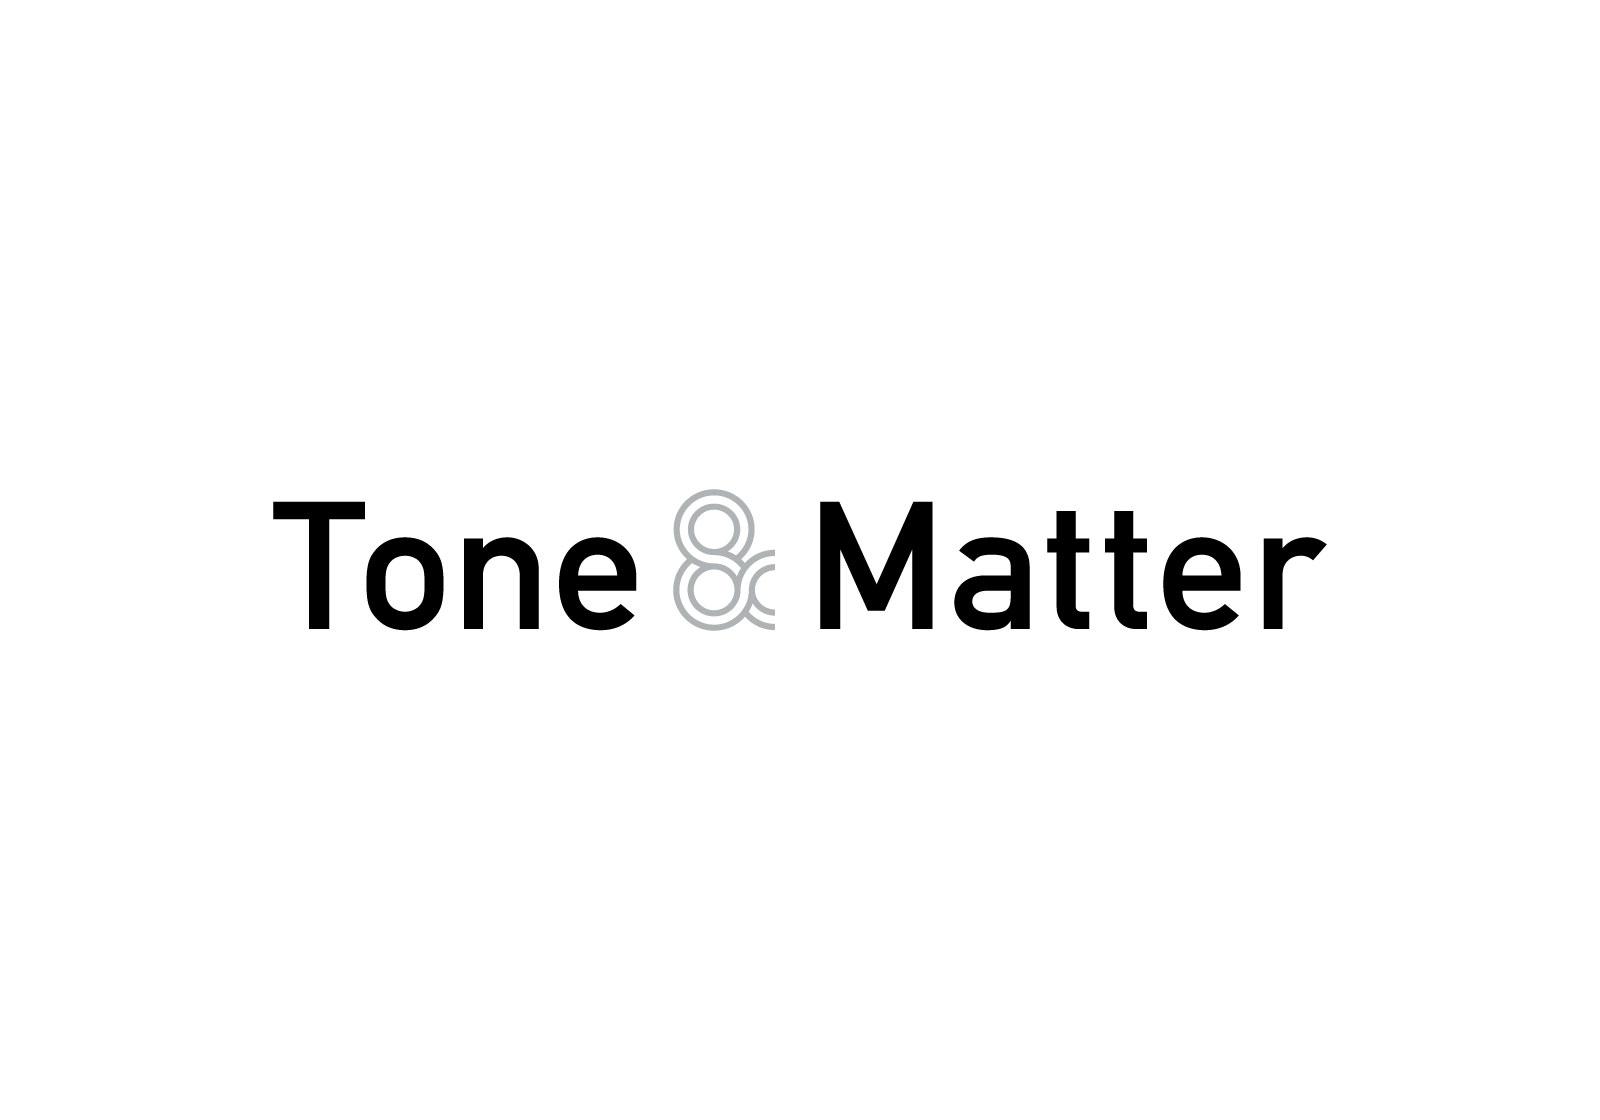 Tone & Matter